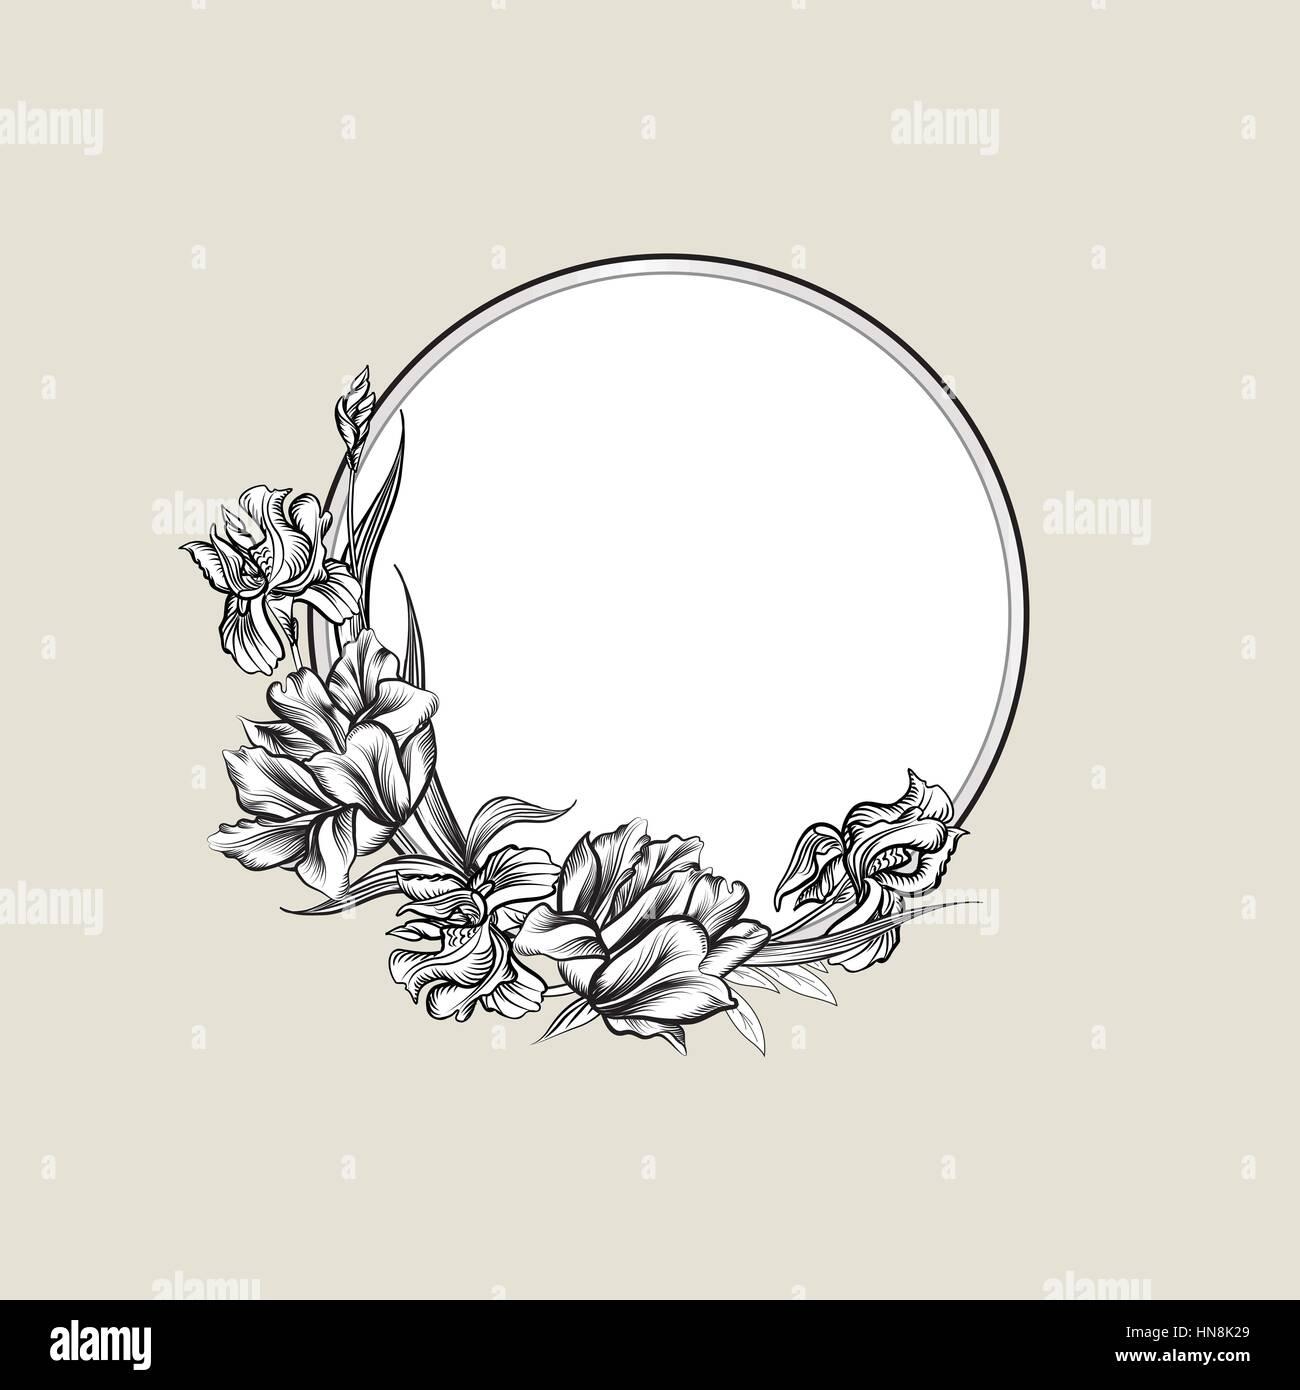 Tulip Flower Illustration Drawing Engraving Stockfotos & Tulip ...